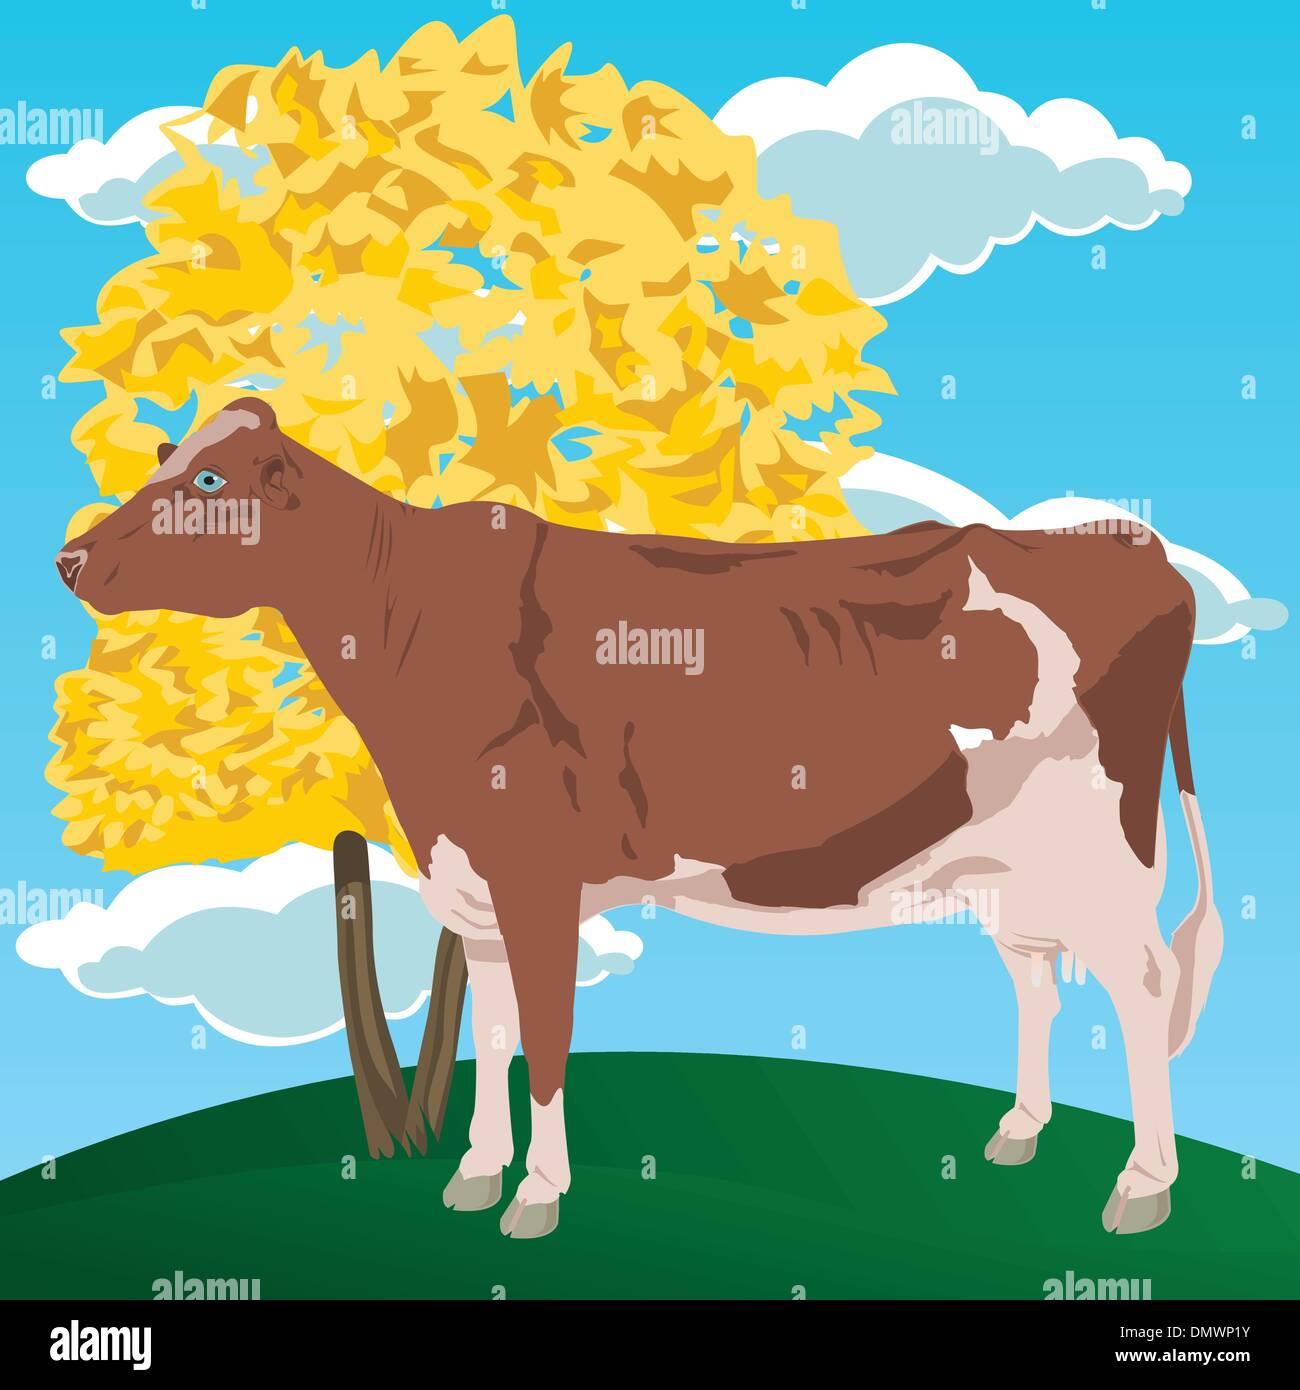 Cow2 - Stock Vector